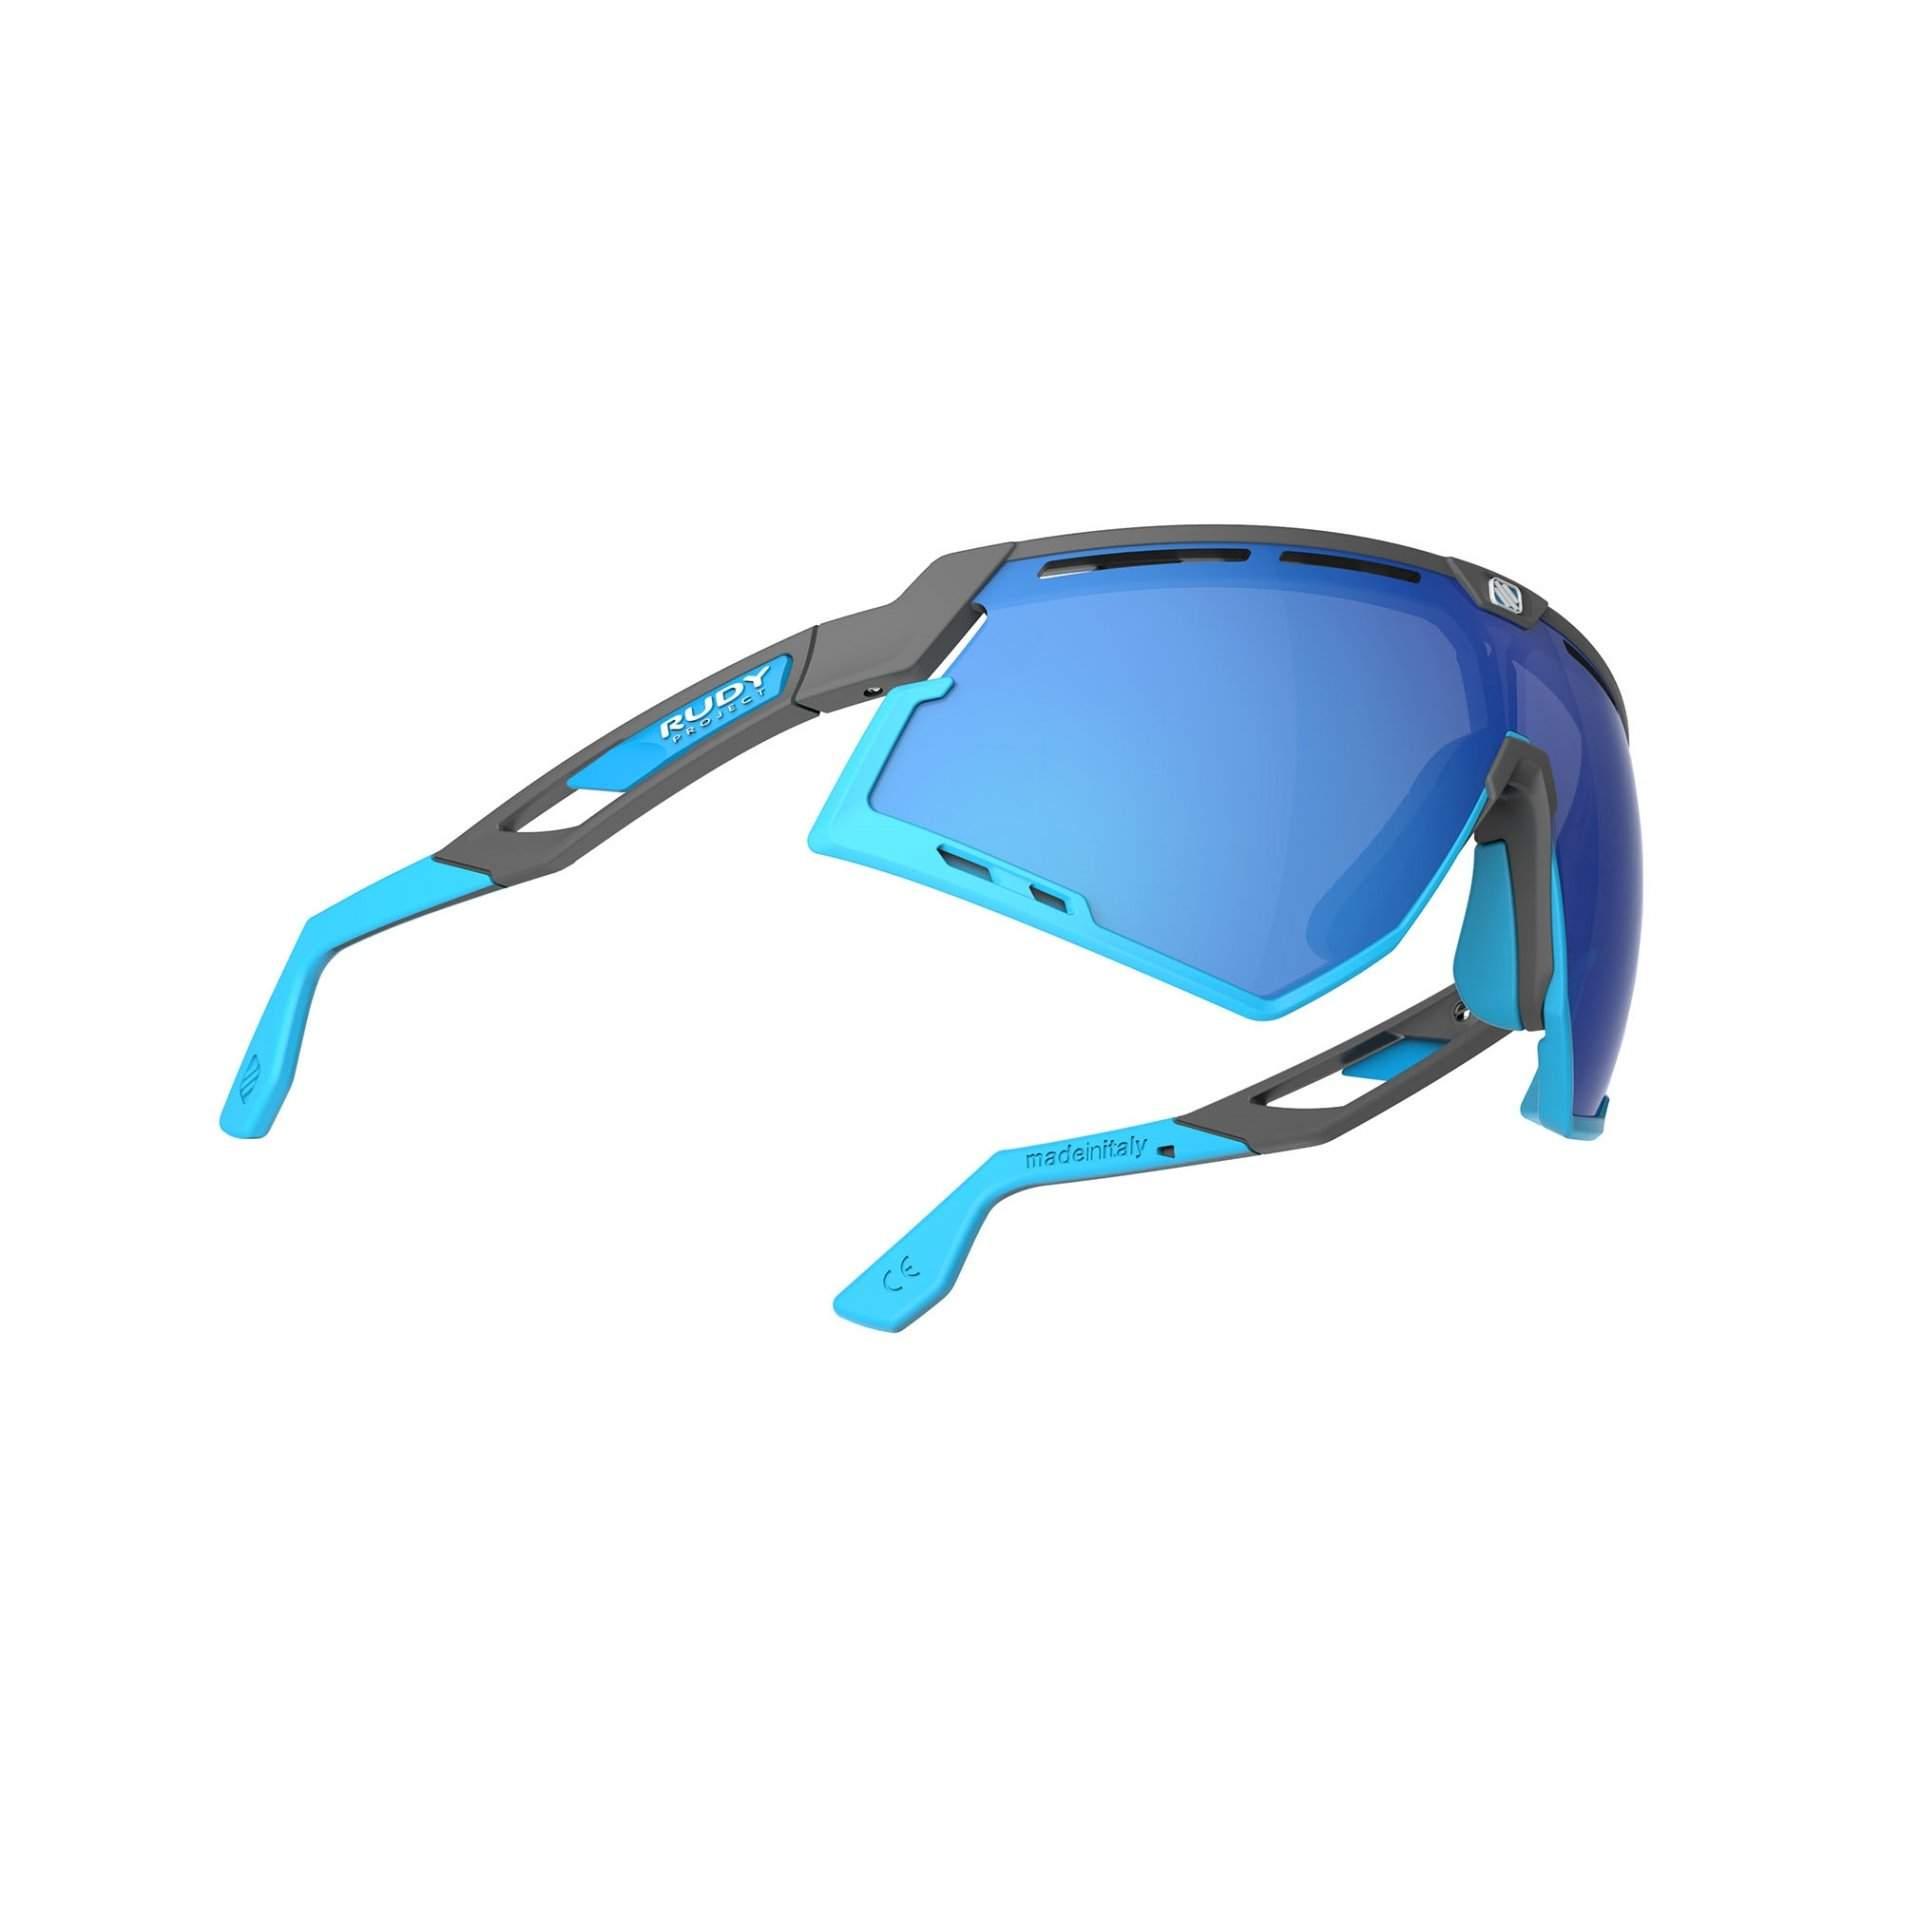 OKULARY RUDY PROJECT DEFENDER MULTILASER BLUE + GGREY BUMPERS AZUR SP5239750002 Z DOŁU